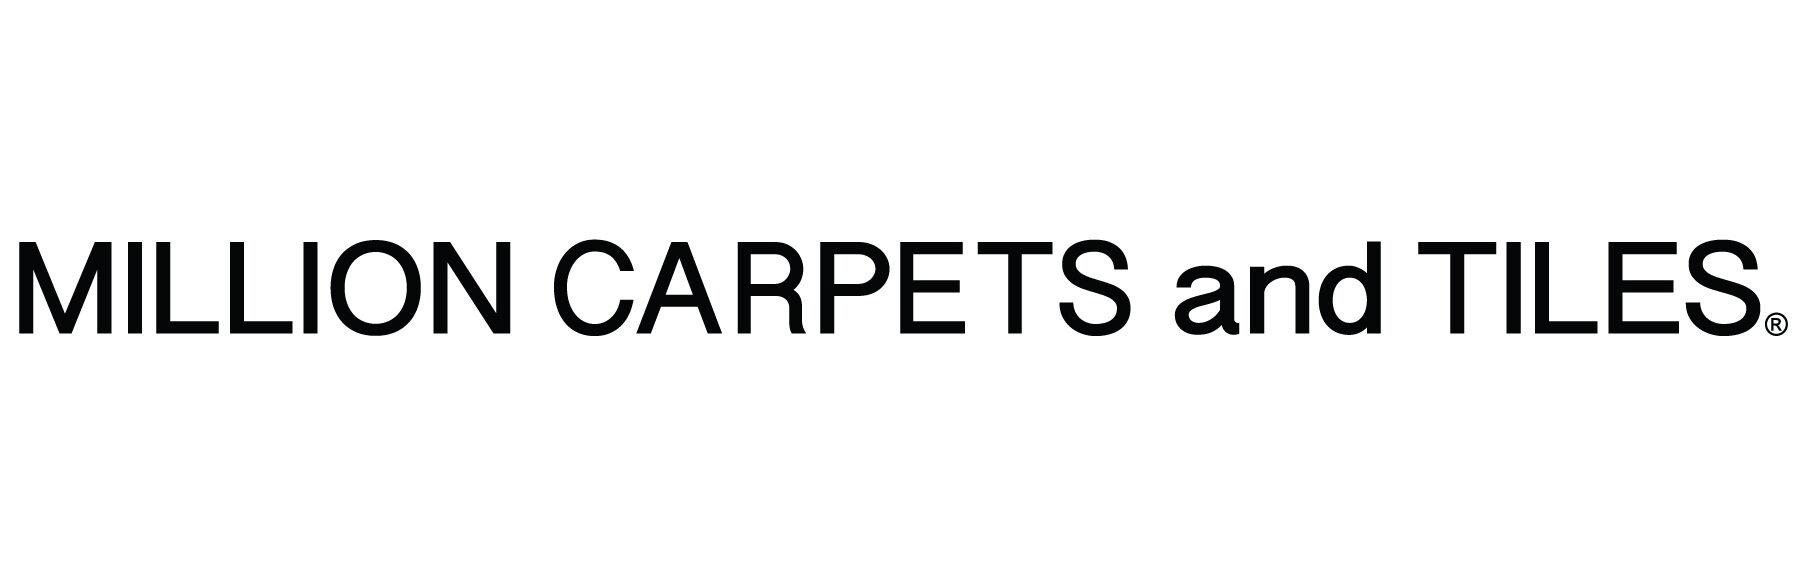 Million carpets and Tiles-02